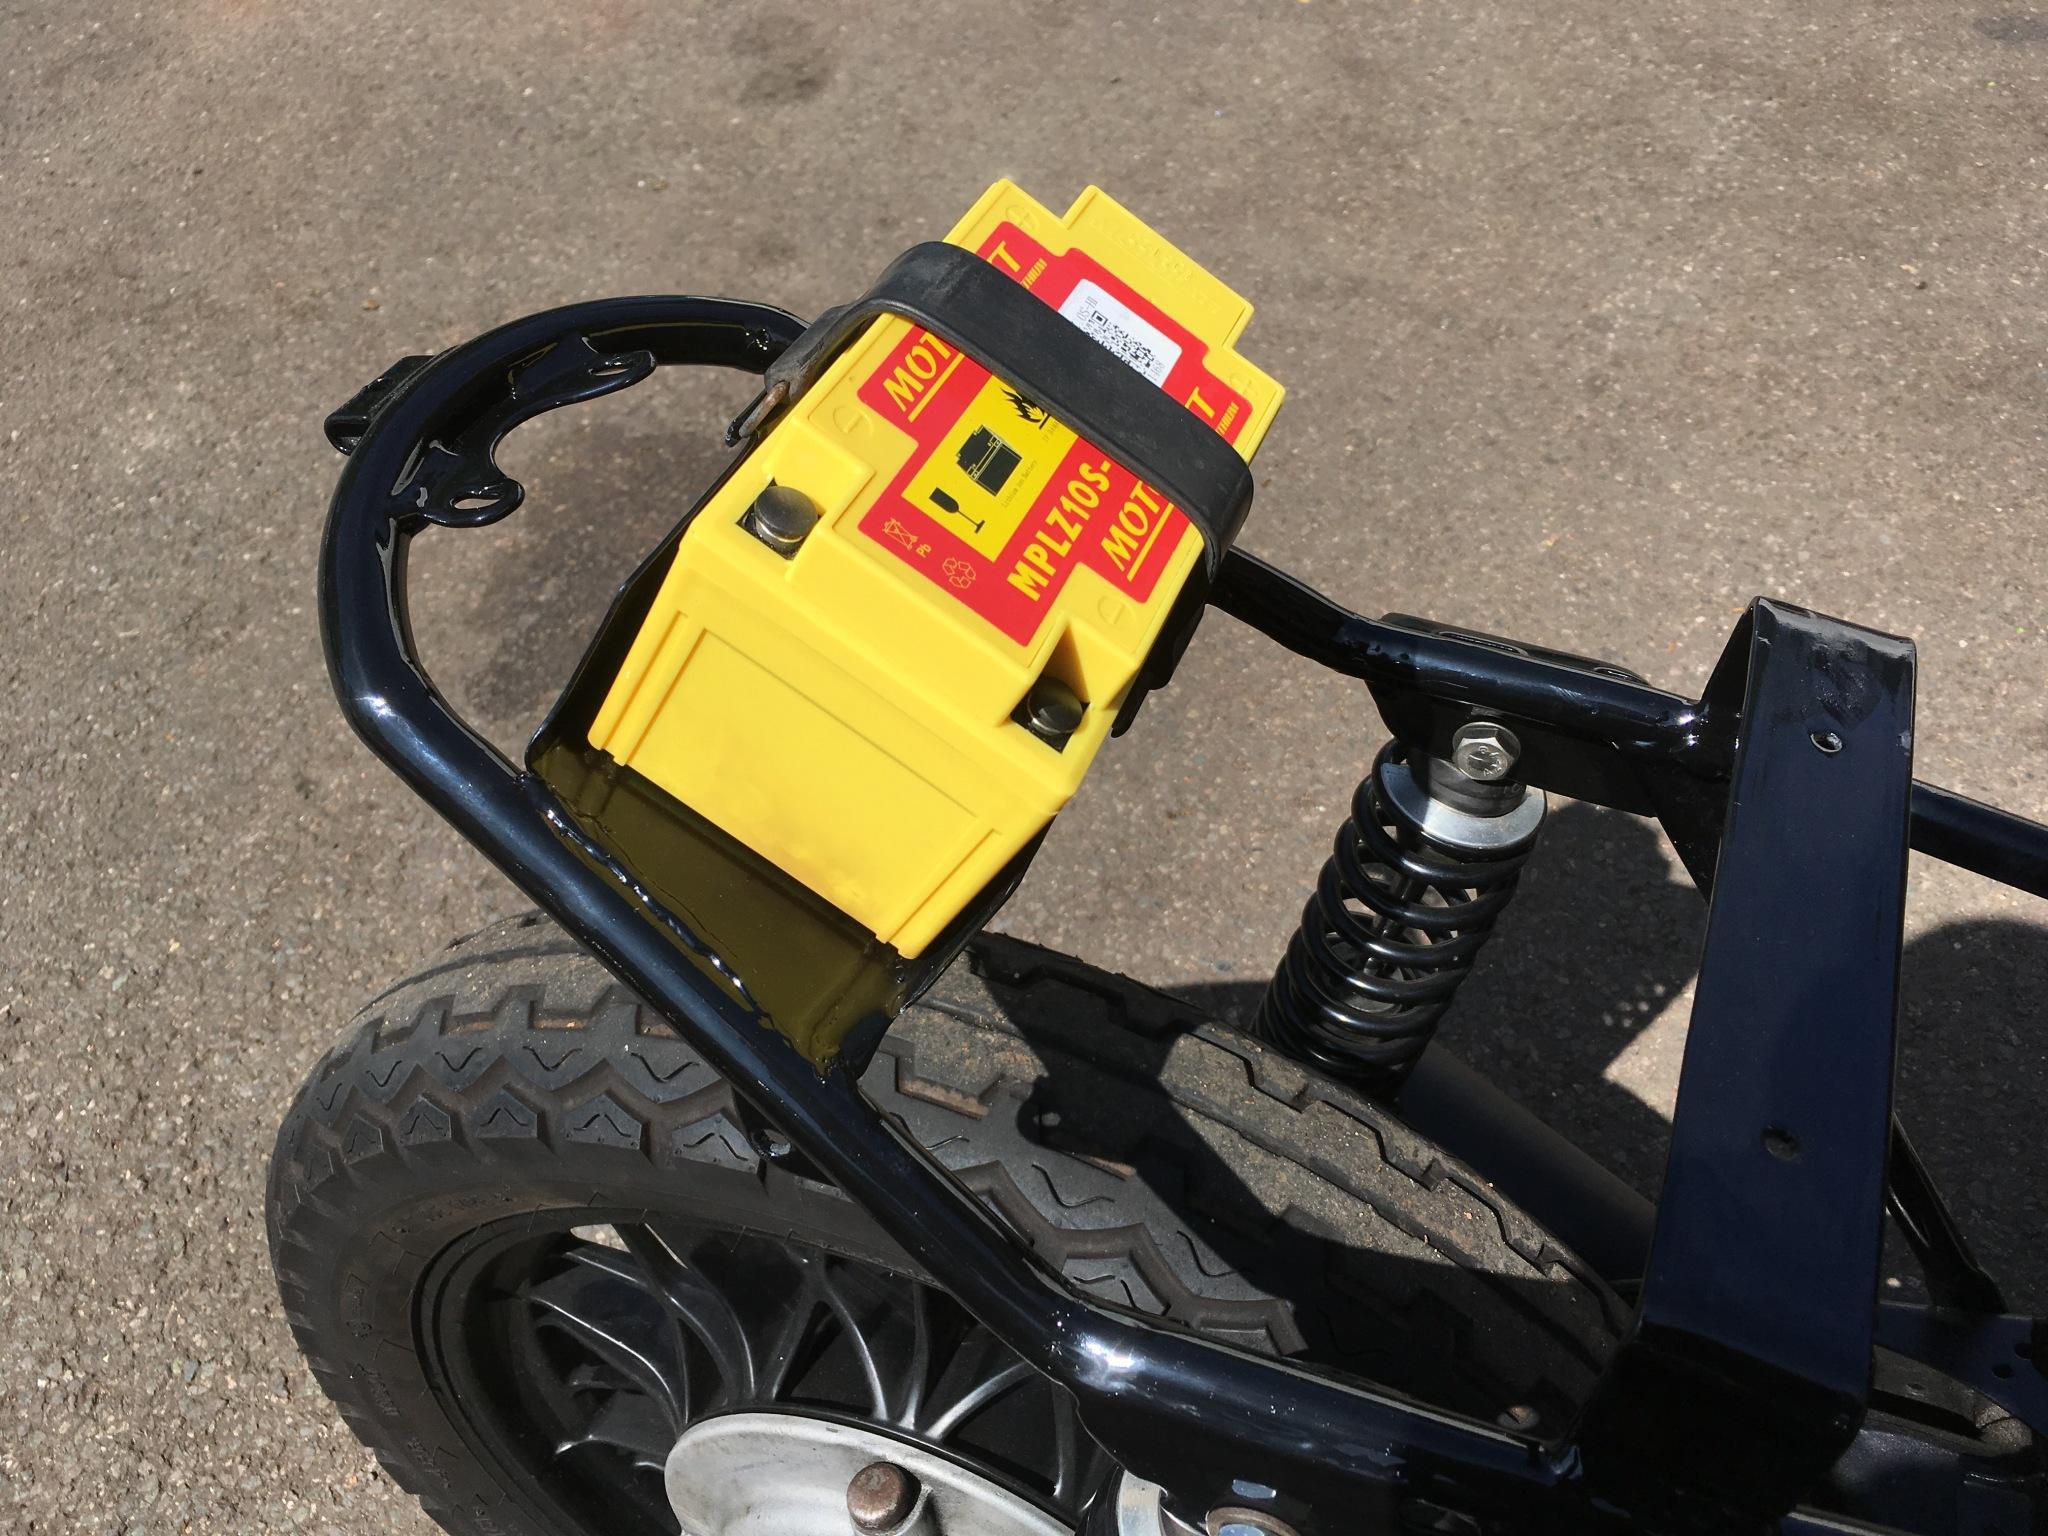 Fabulous Bmw R100 Cafe Racer Custom Wiring Loom Wiring Cloud Mangdienstapotheekhoekschewaardnl